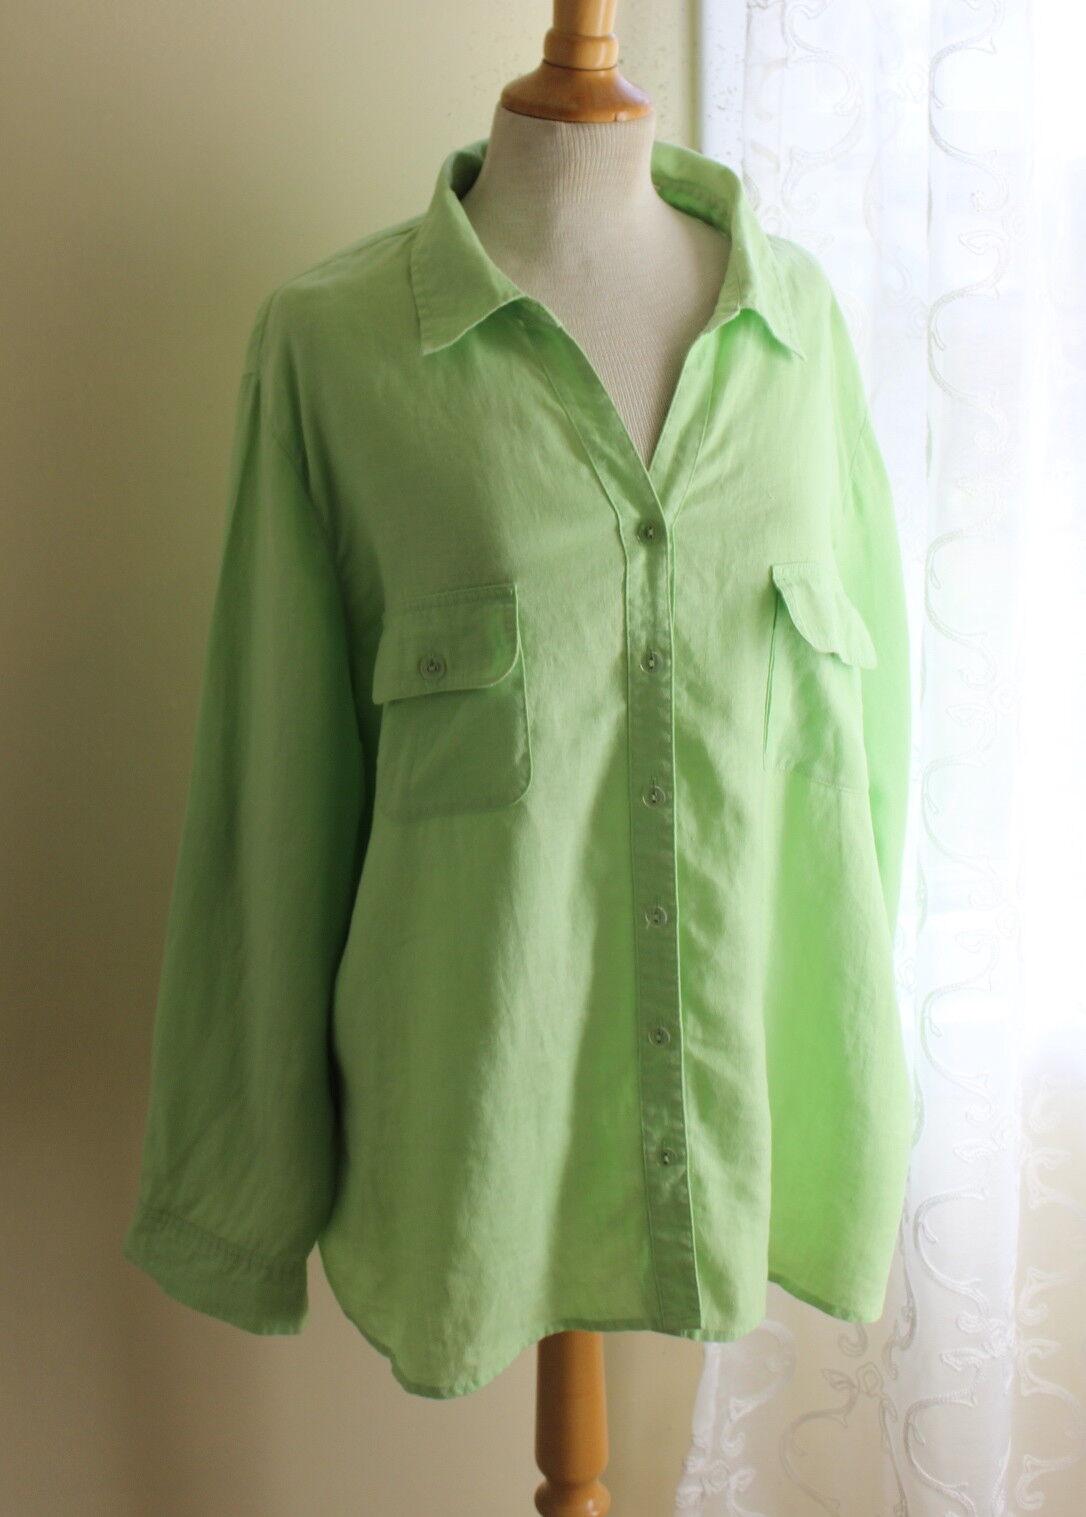 Studio Works Sz 2X Elegant Key-Lime Artsy Linen V-Neck Easy Shirt Top -Breezy